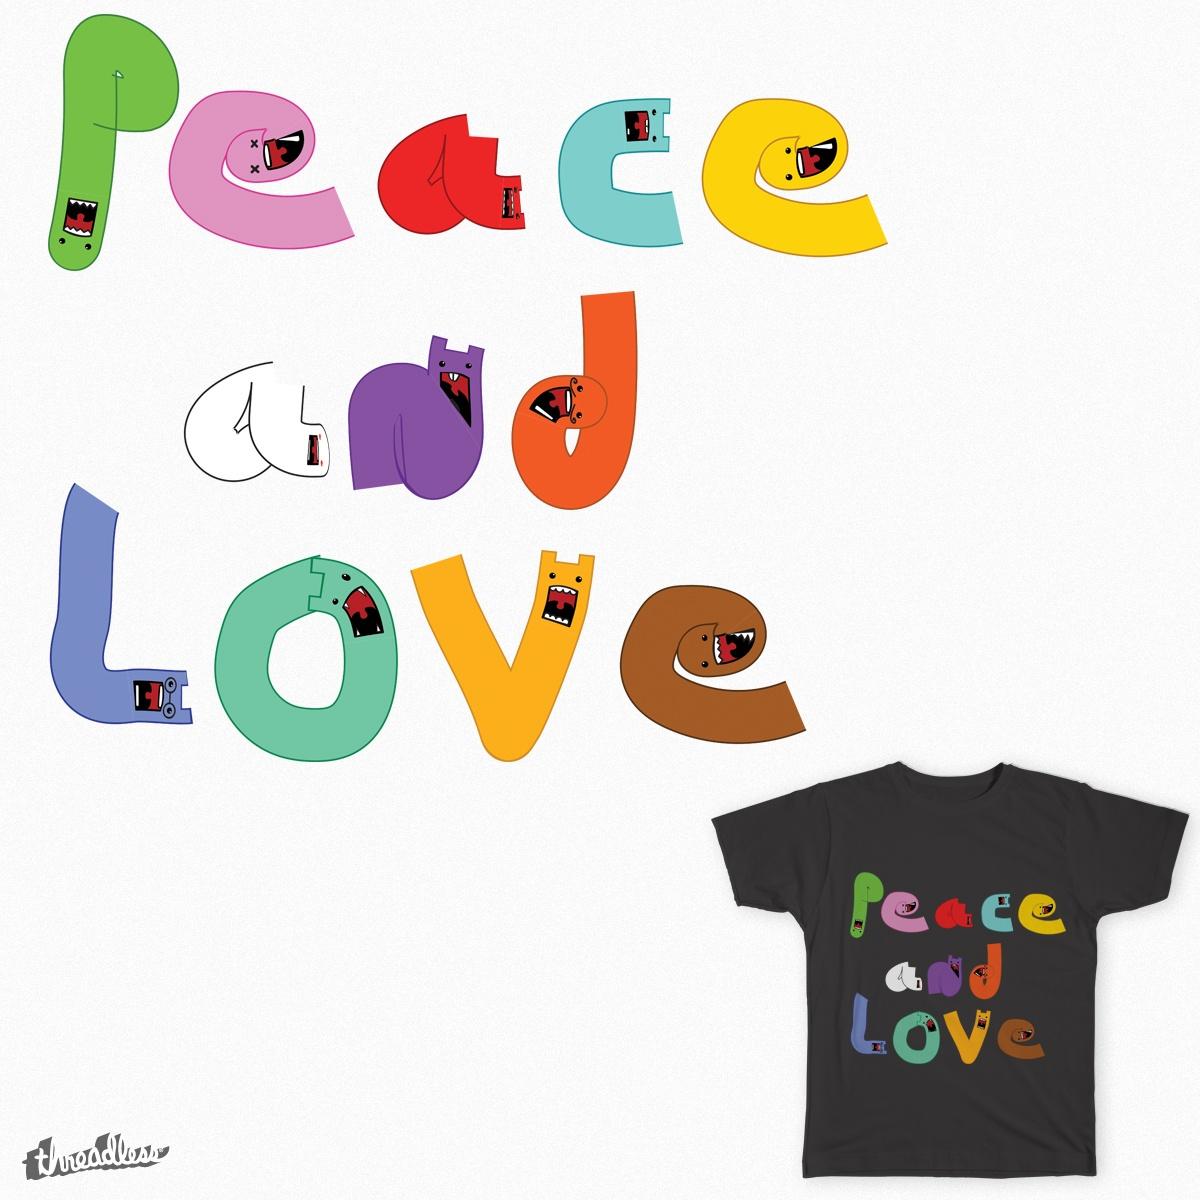 Peace and Love by jumbogiant21 on Threadless